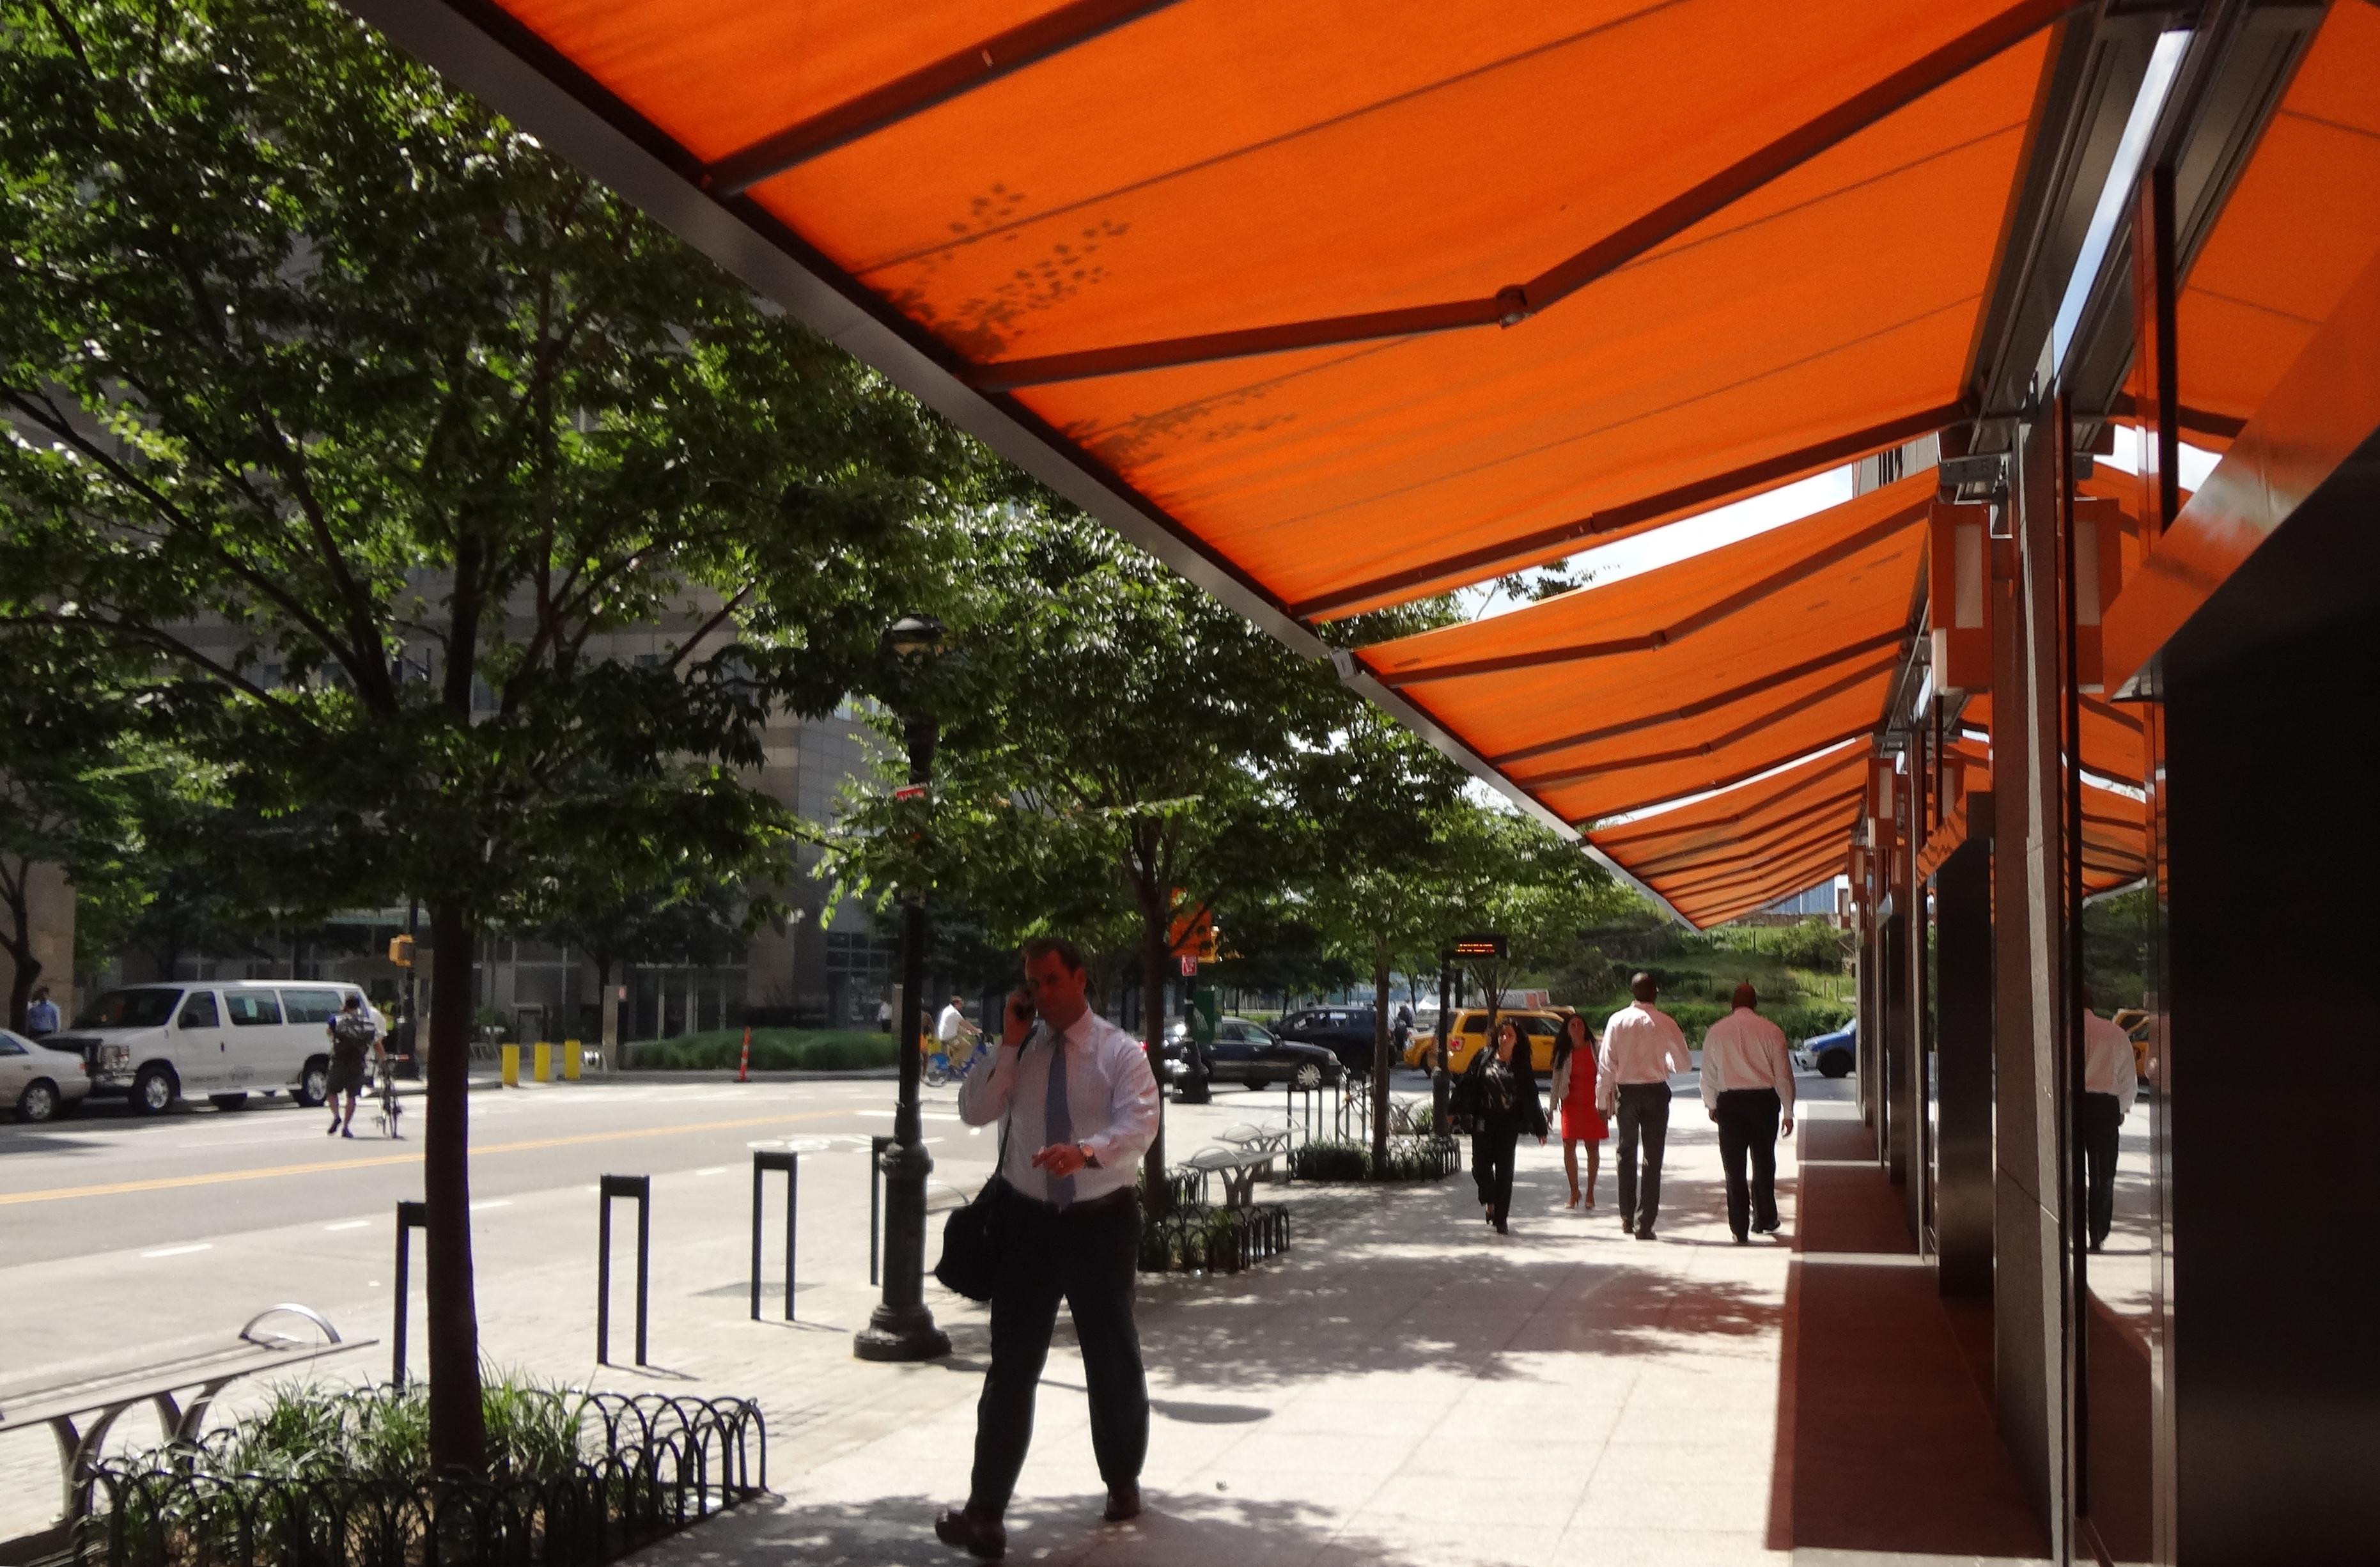 Conrad-orange-awning